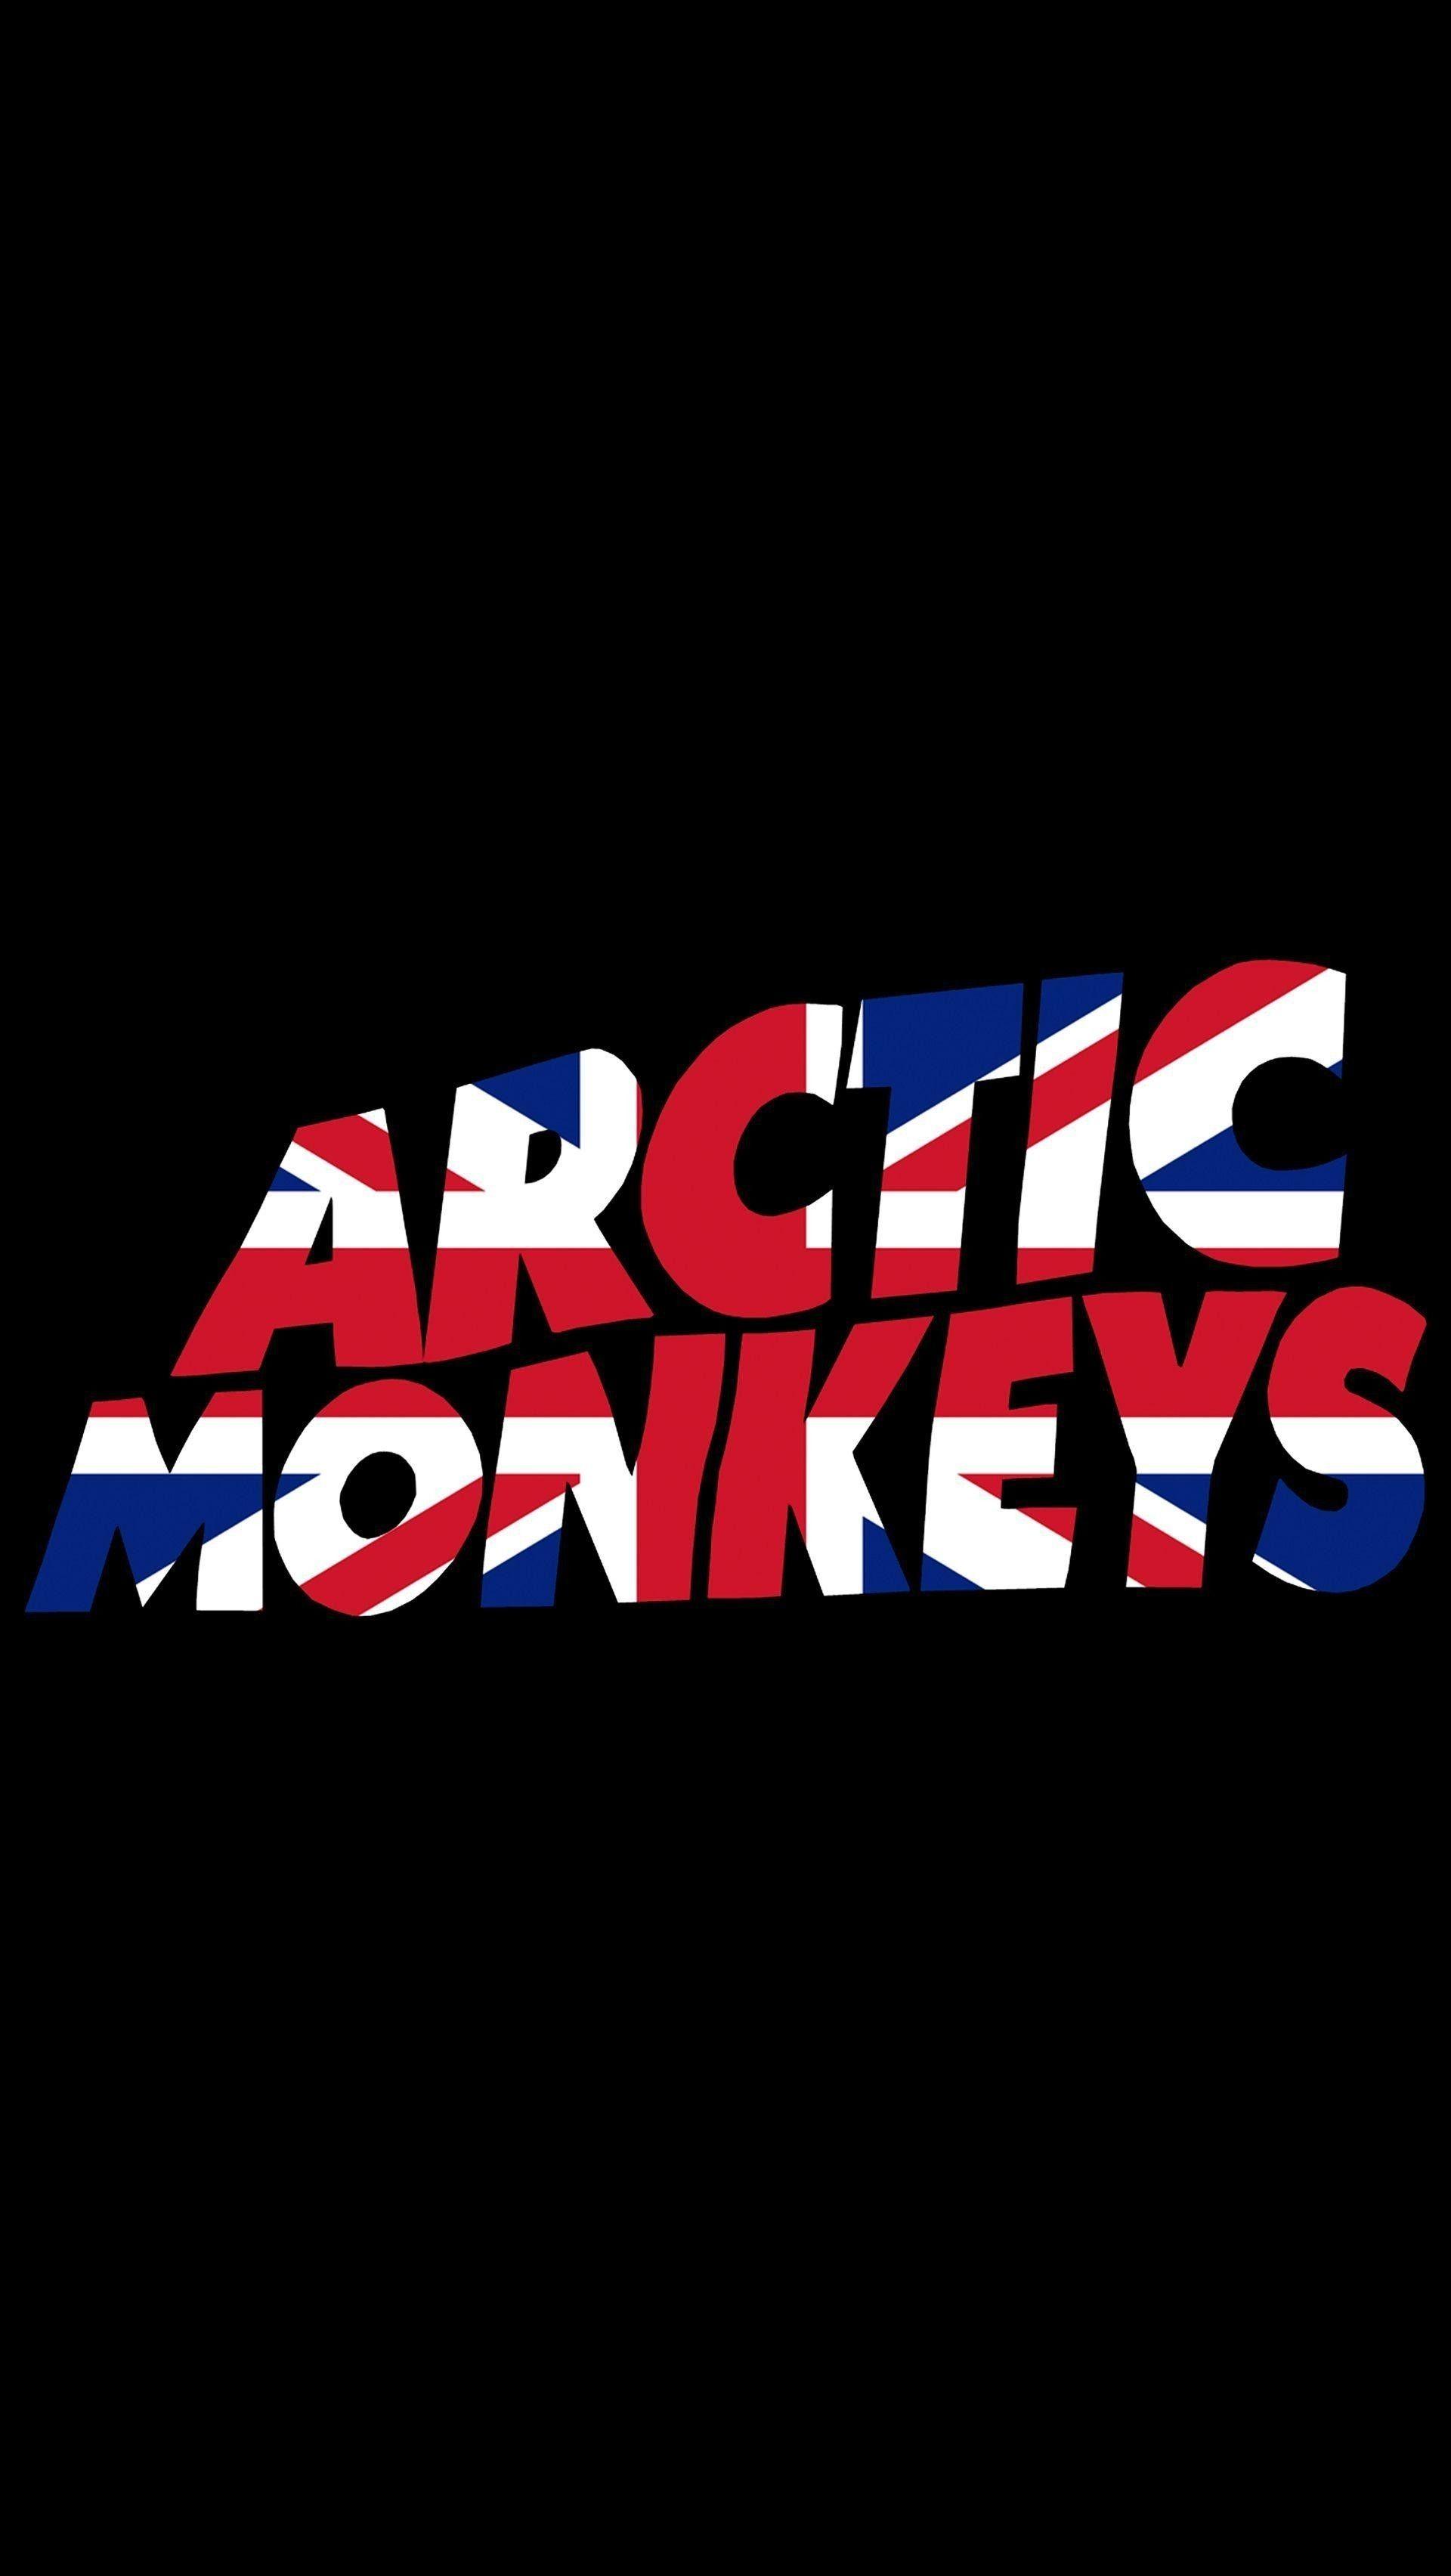 10 Top Arctic Monkeys Wallpaper Iphone Full Hd 1080p For Pc Background Arctic Monkeys Wallpaper Monkey Wallpaper Arctic Monkeys